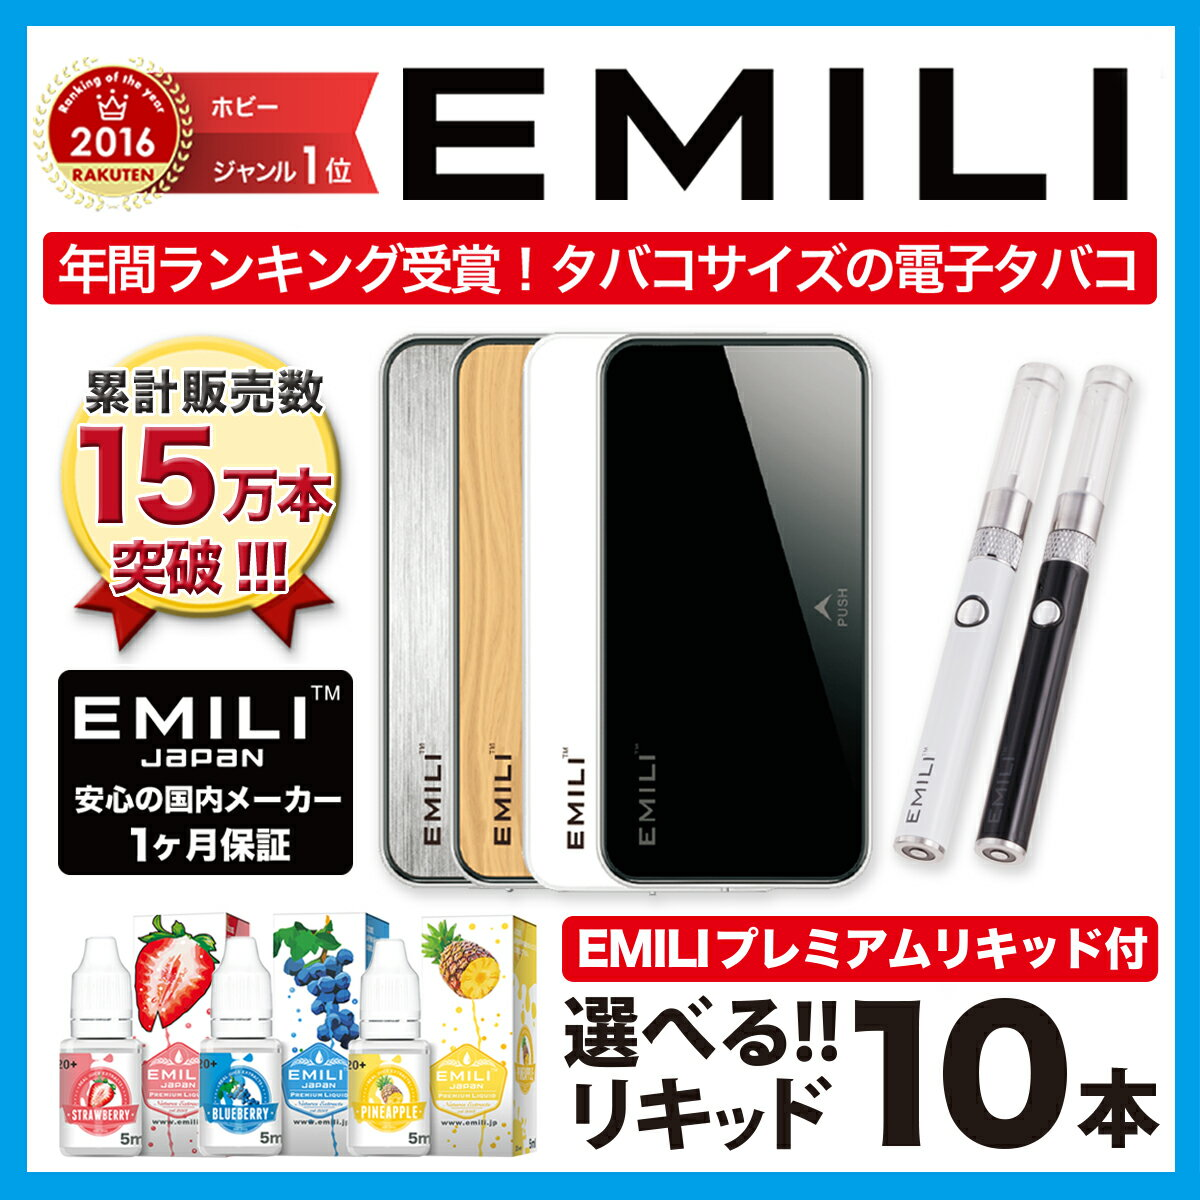 EMILI日本総代理店 持ち運び充電機能搭載【年間ランキング1位商品】【送料無料】コンパクトな電子タバコ! smiss EMILI【エミリ】EMILI mini+ joecig x-tc-2 電子たばこ リキッド アイコスやプルームテックなどの加熱式タバコではありません プレゼント 卸販売